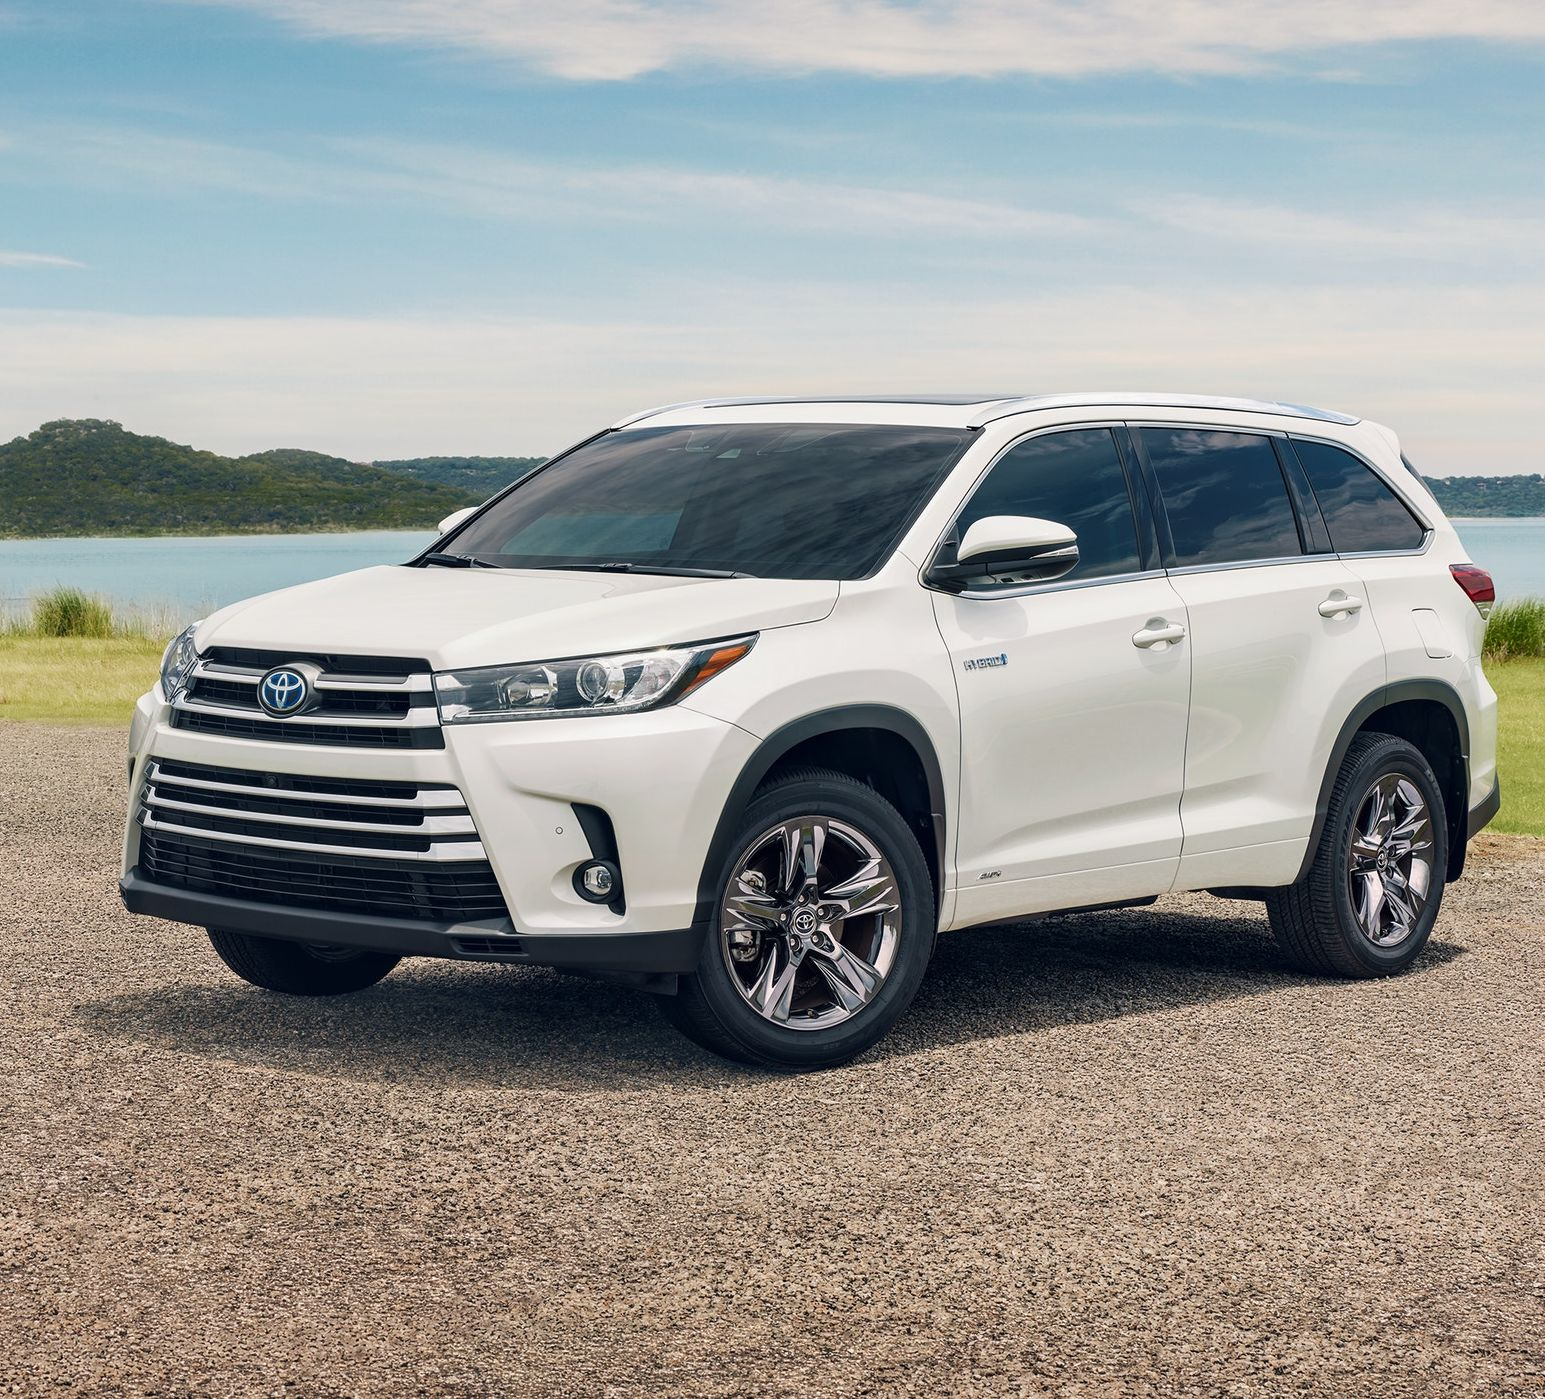 2019 Toyota Highlander Hybrid for Sale near Belton, MO, 64012